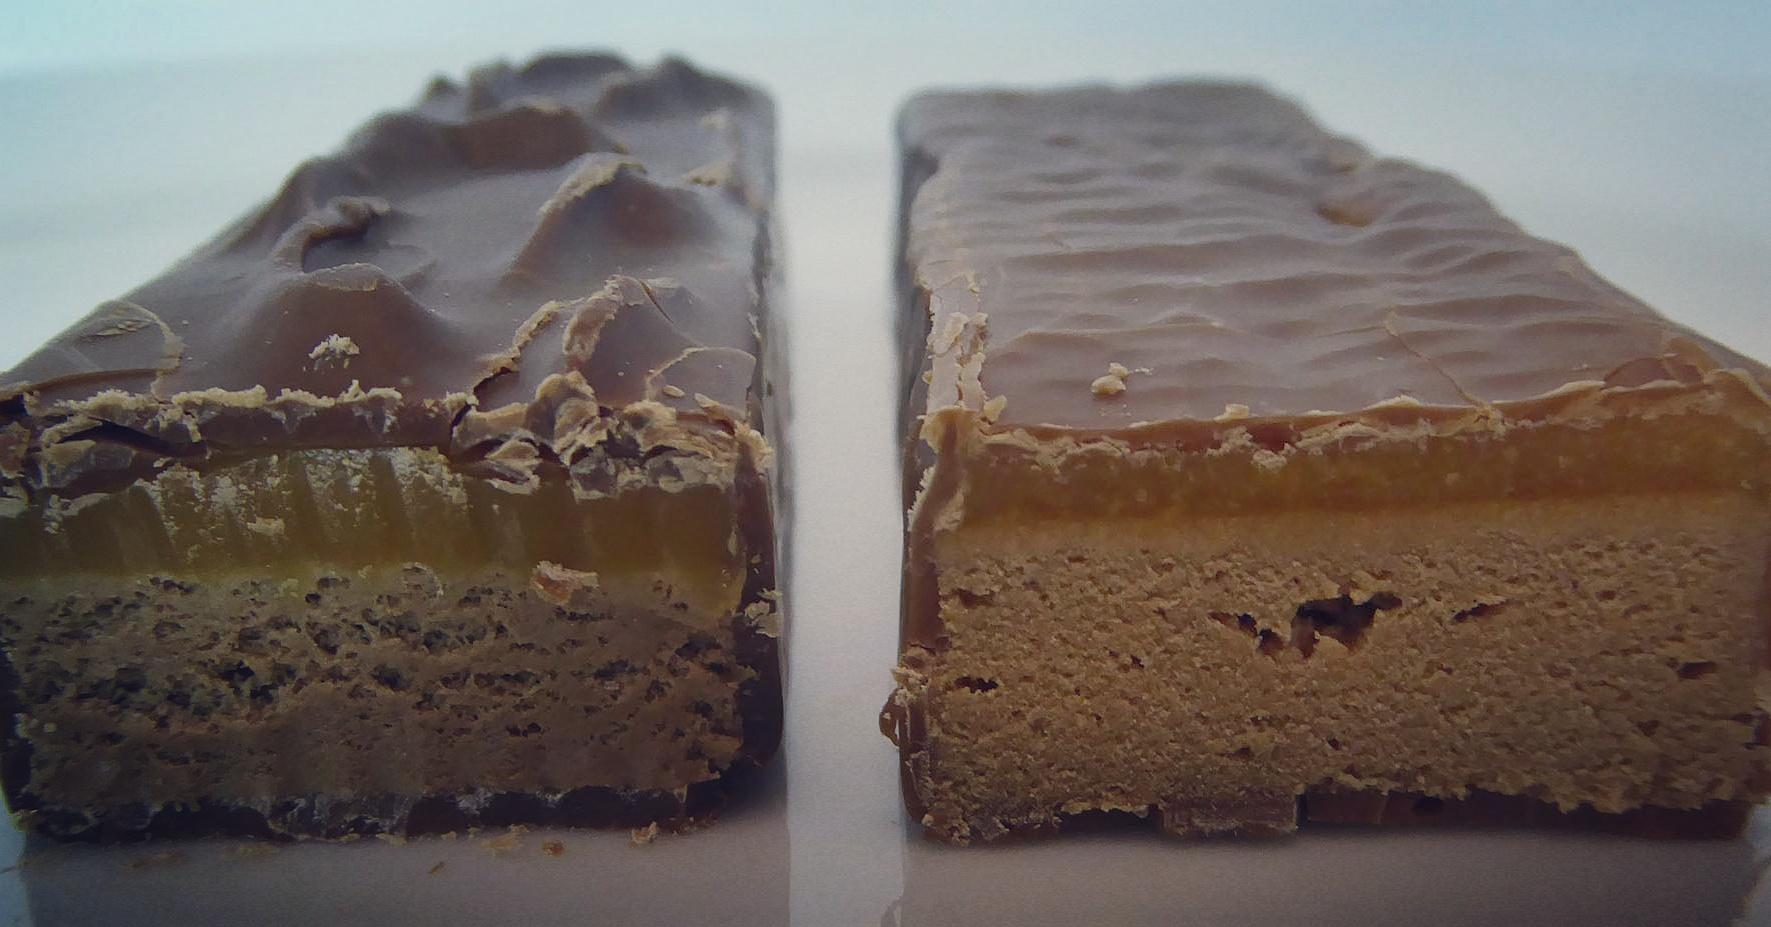 Mars Protein Proteinbar chocolate bar